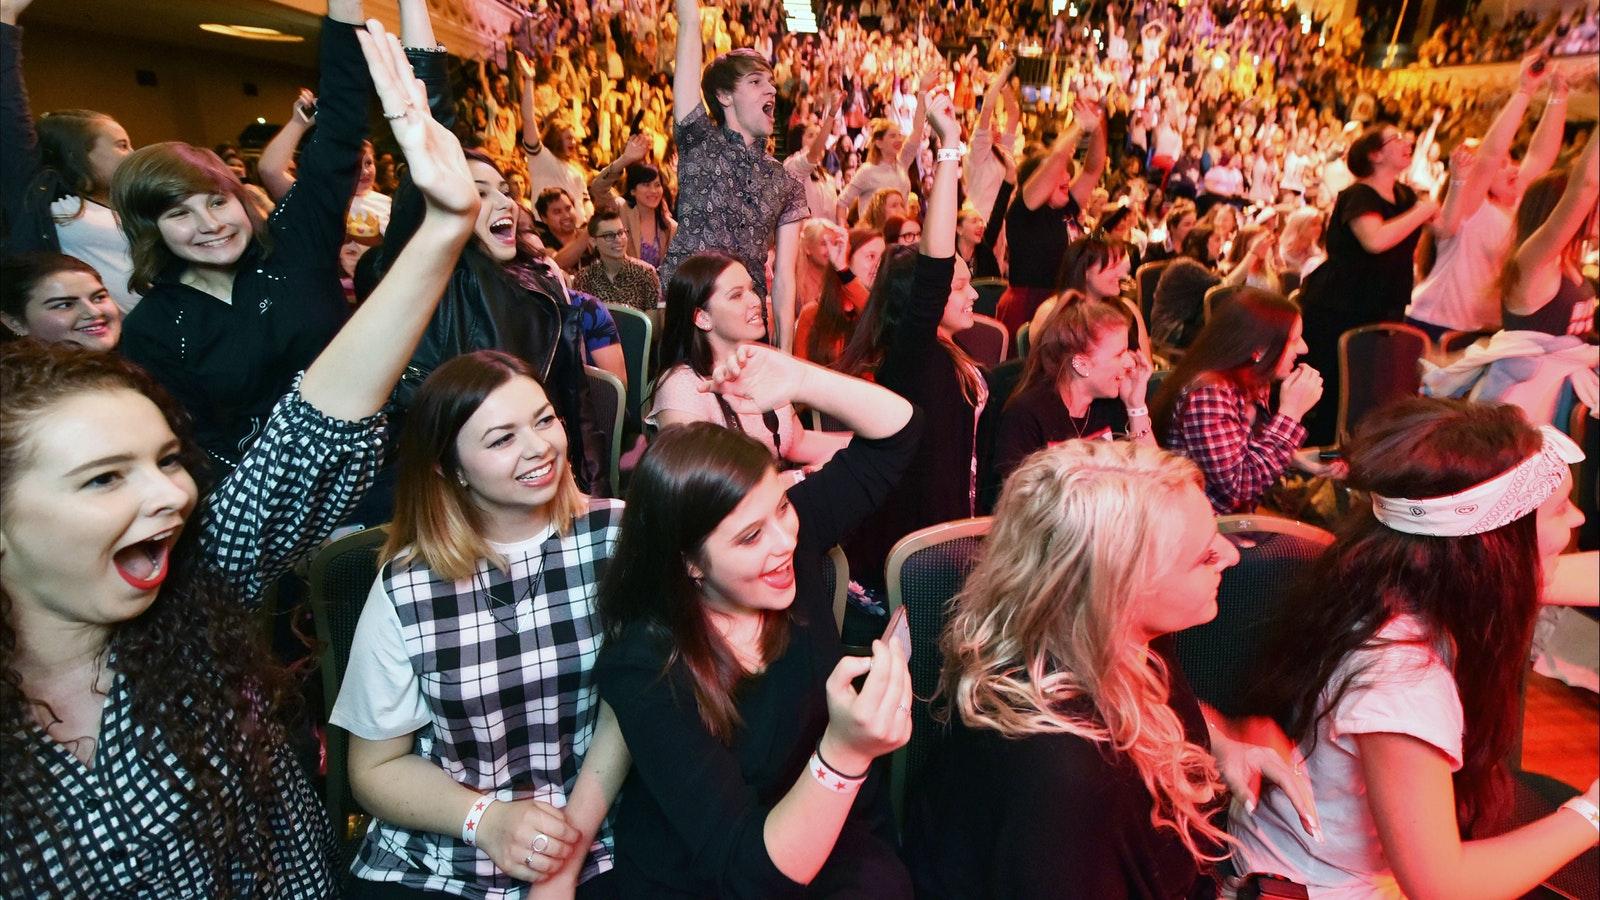 Melbourne International Comedy Festival Weiner Contest